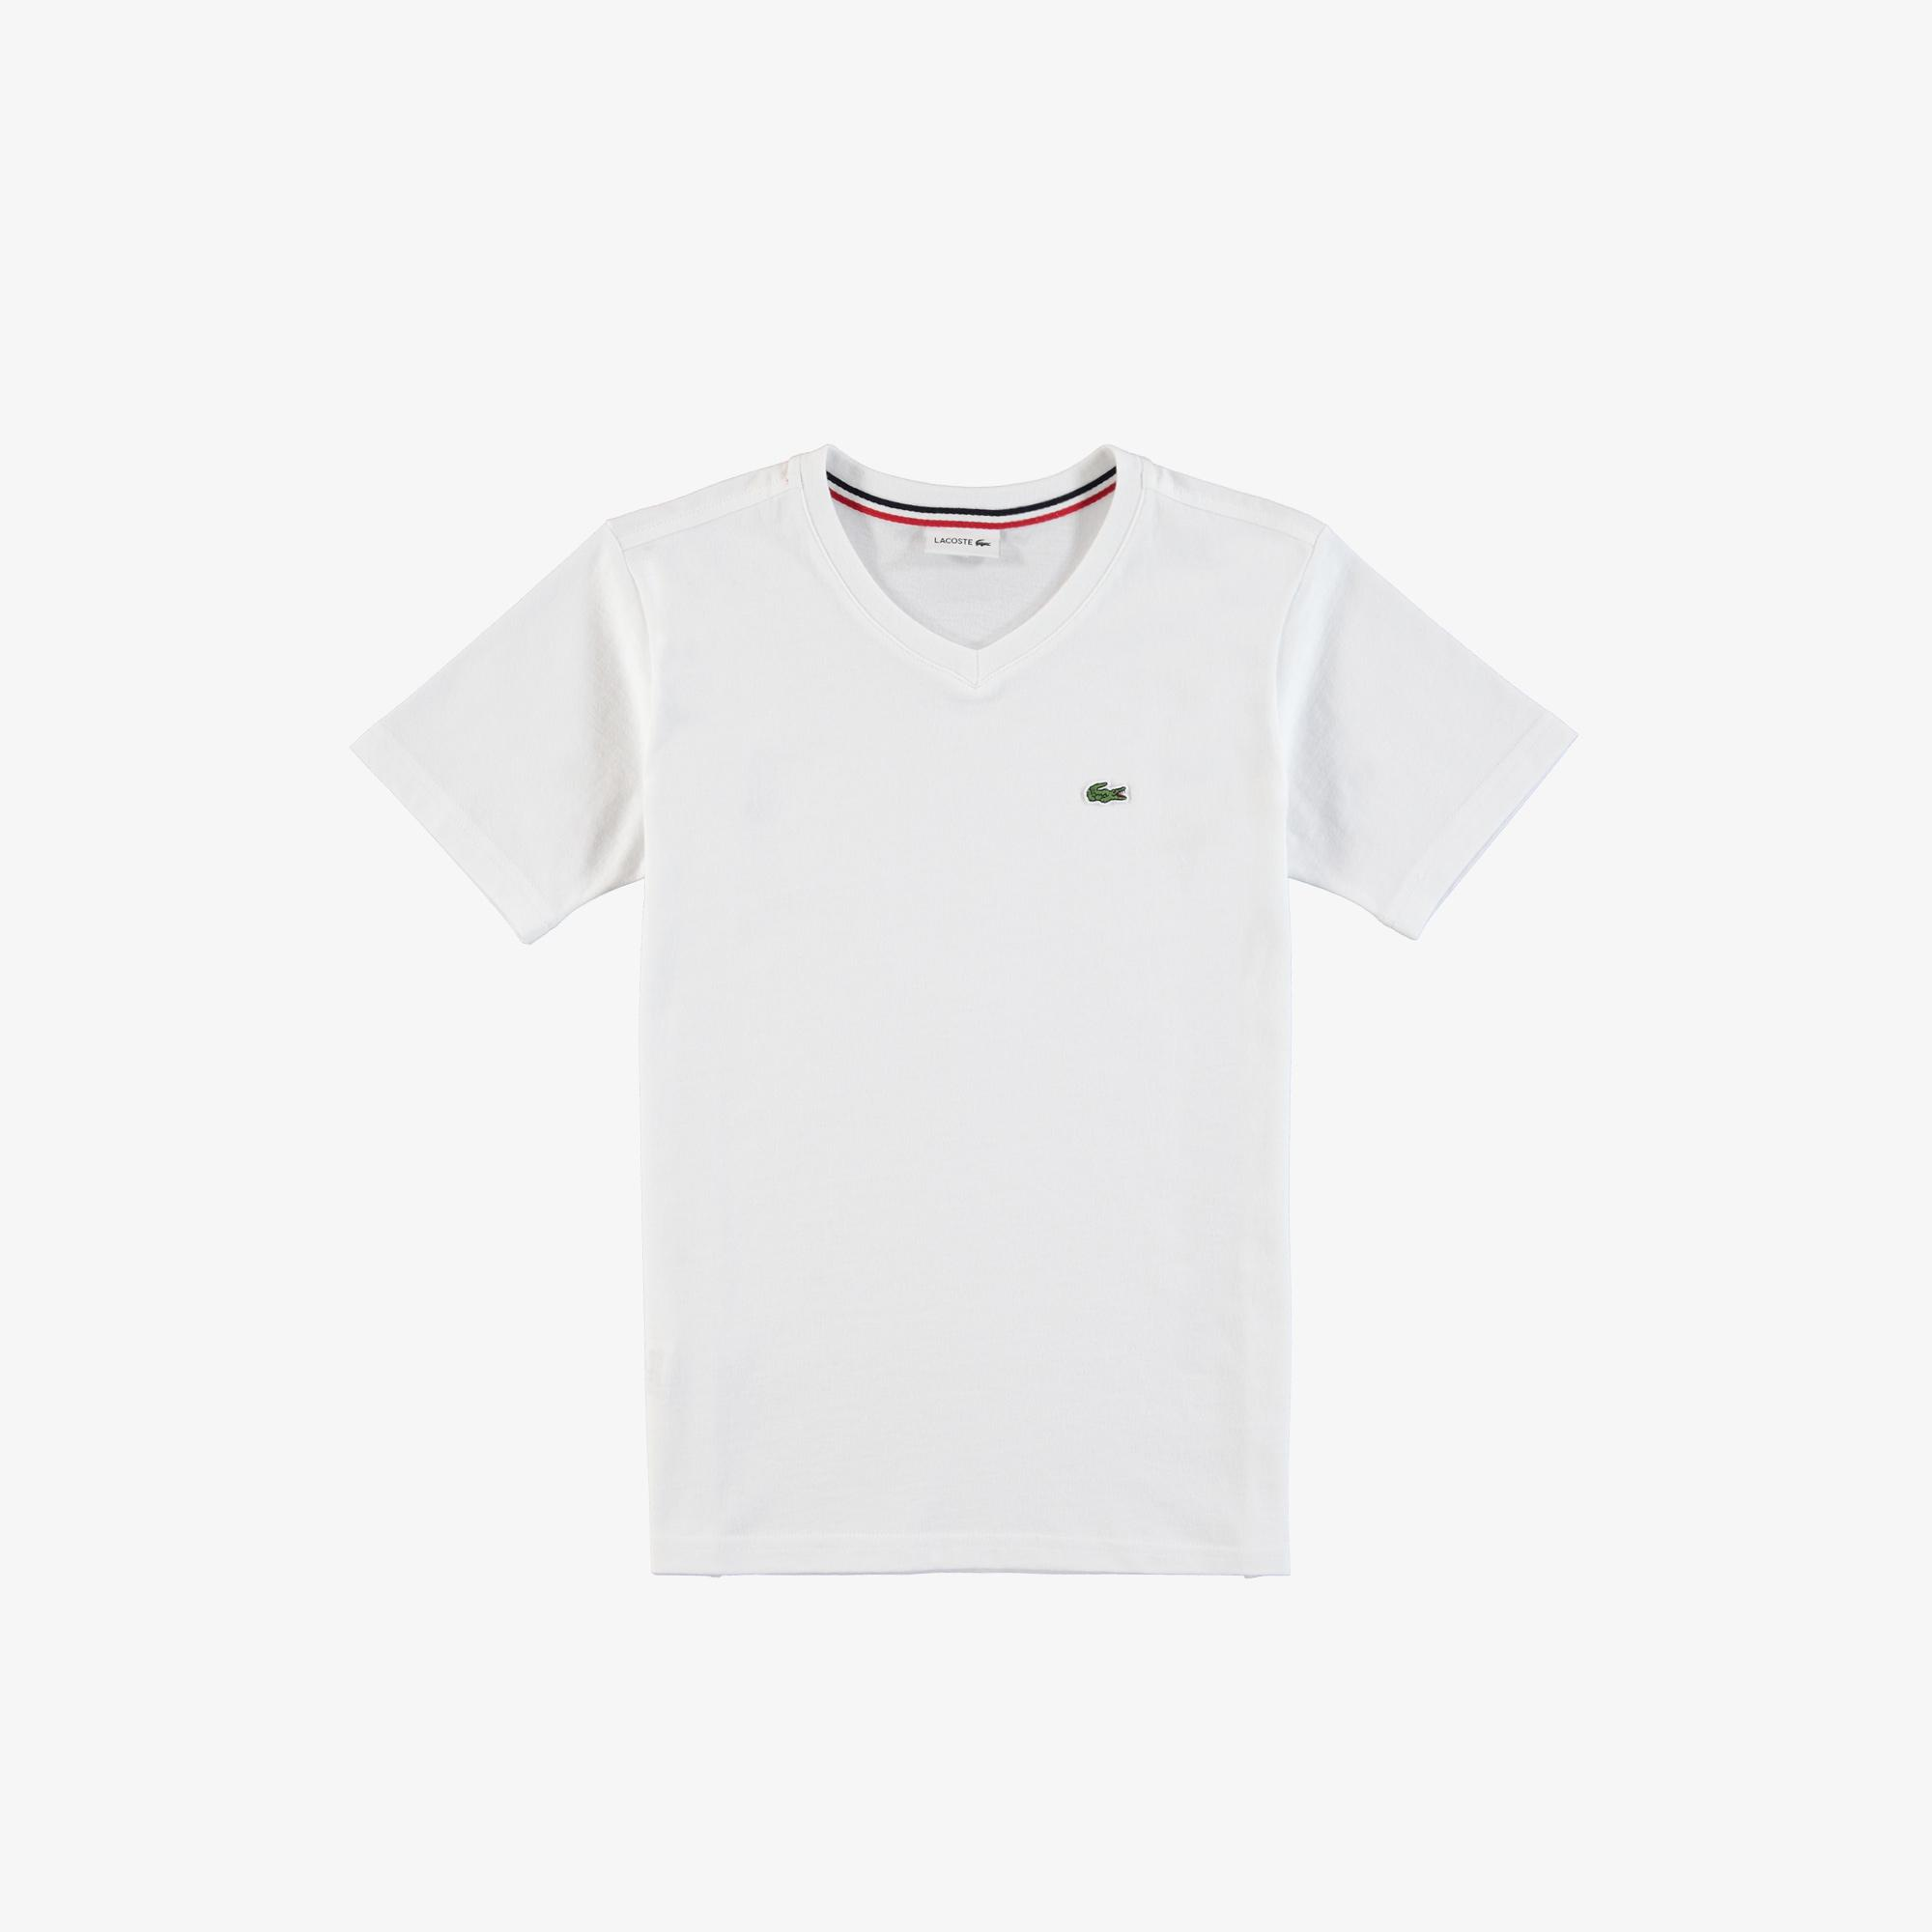 Lacoste Çocuk V Yaka Beyaz T-Shirt